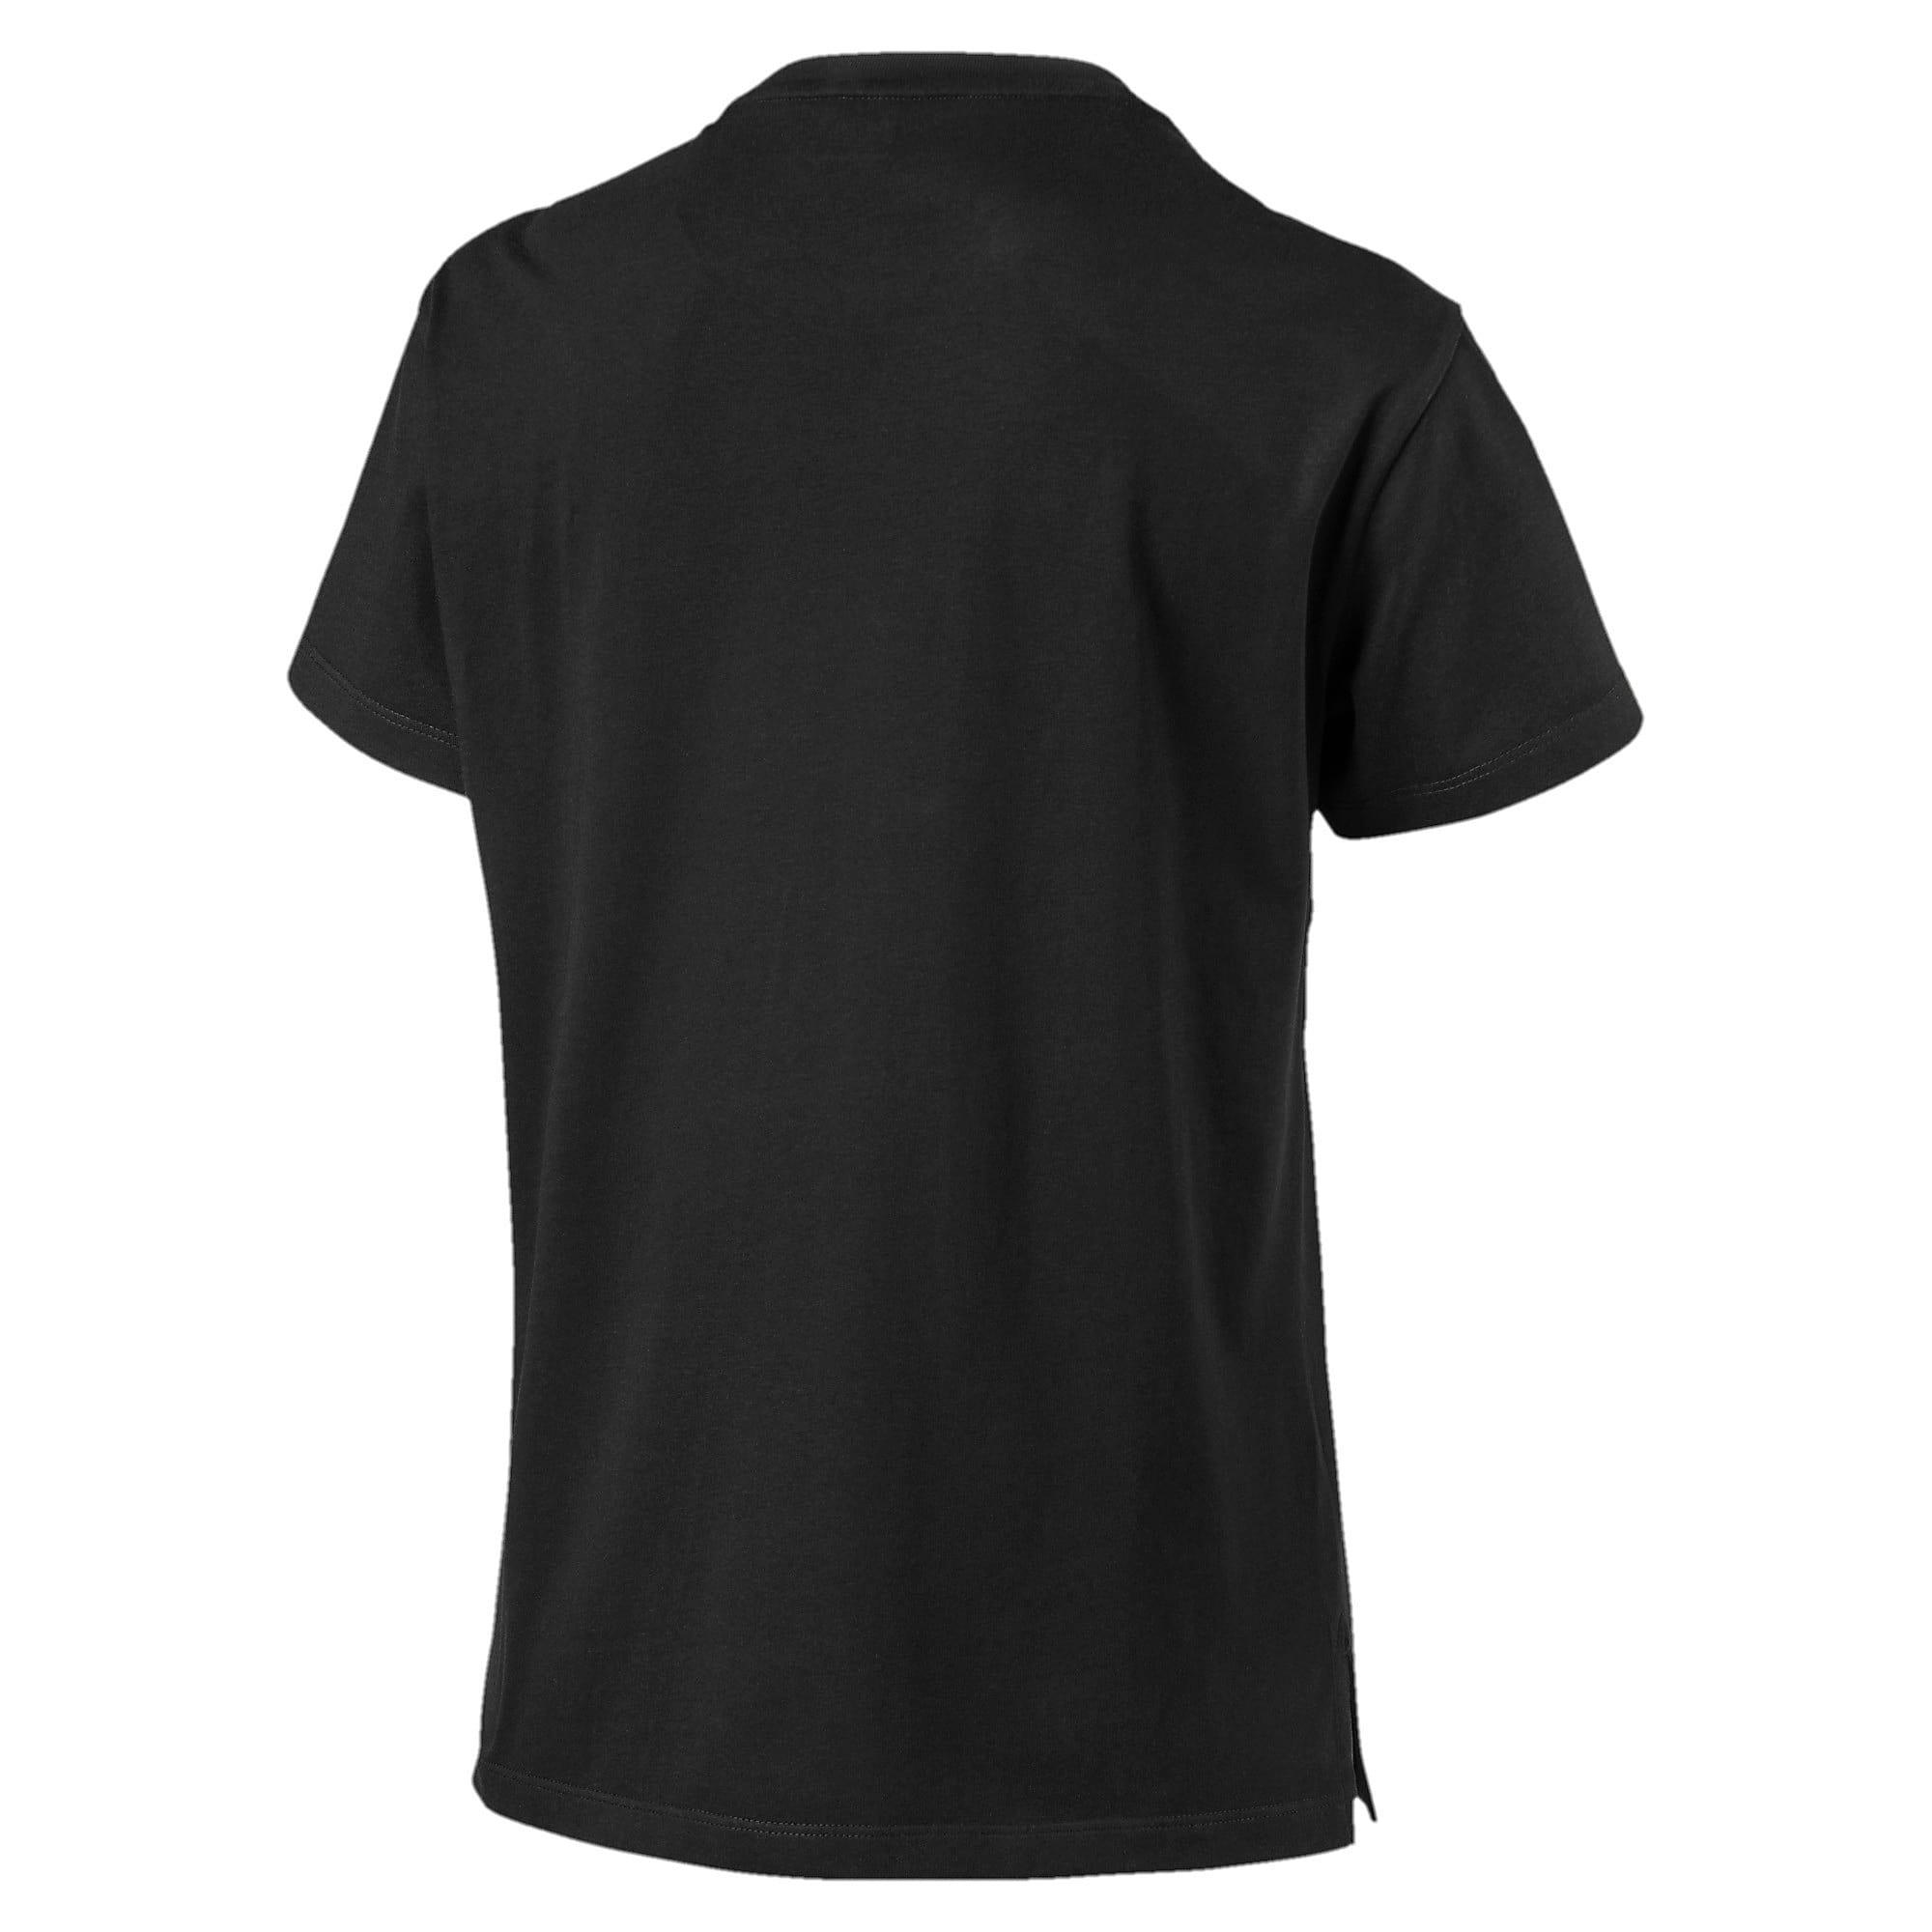 Thumbnail 3 of CLOUD パック ウィメンズ グラフィック Tシャツ, Puma Black, medium-JPN